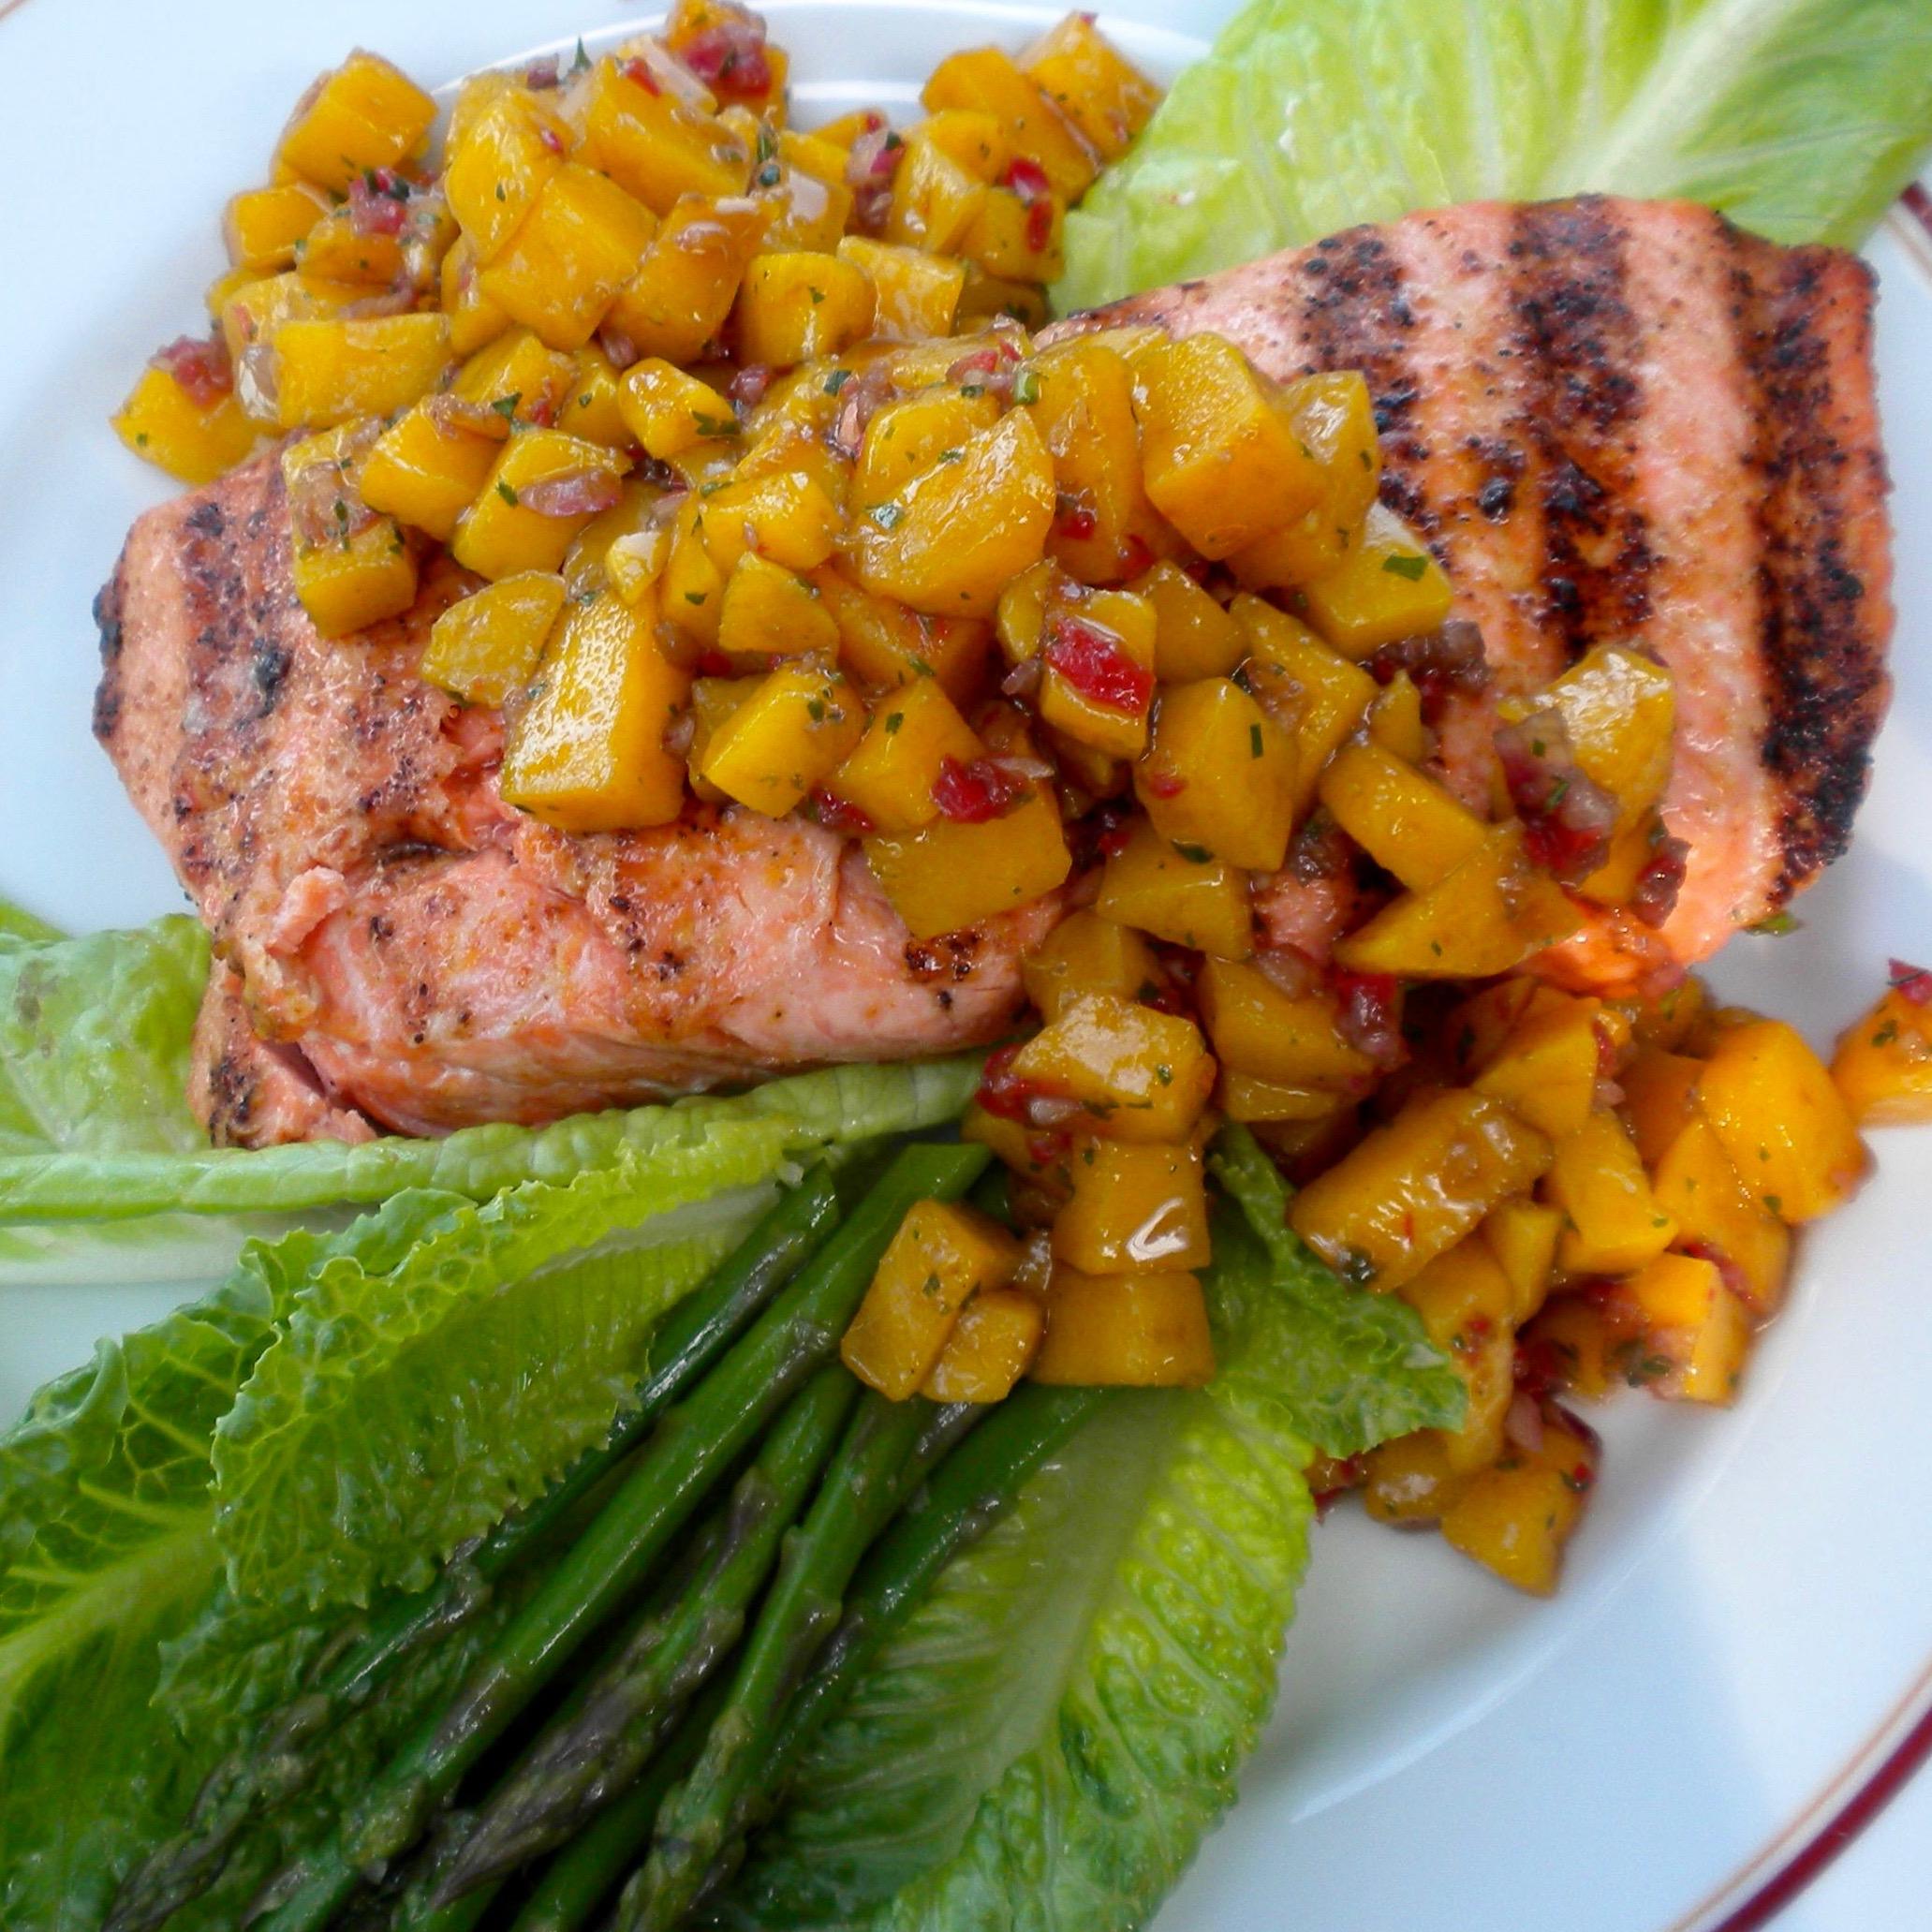 Grilled Salmon & Asparagus with Mango Salsa